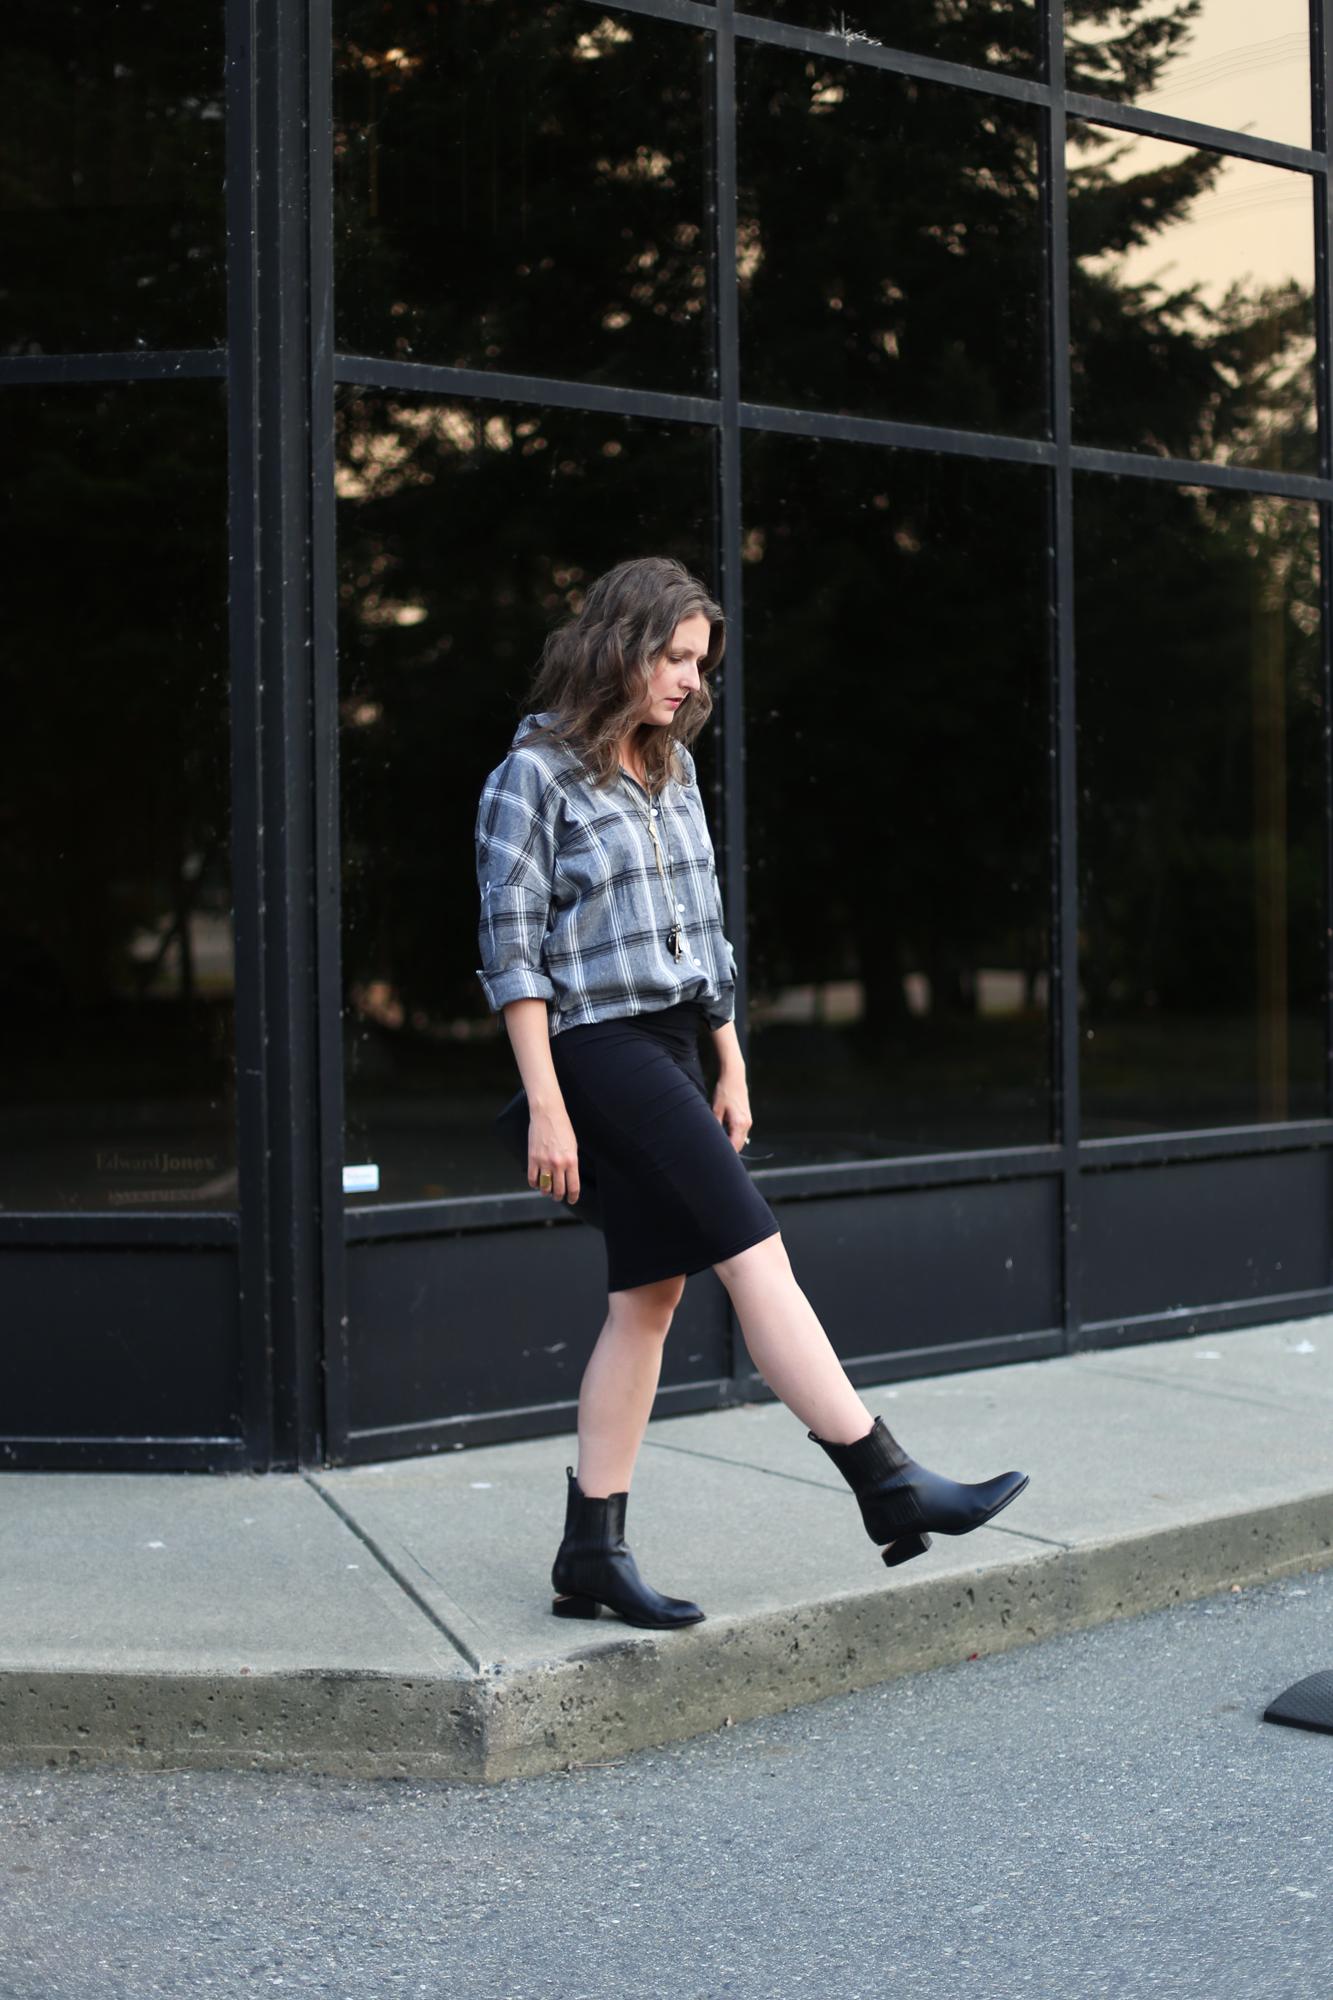 minimalist outfit ideas: black bag, black skirt, alexander wang boots, and a plaid shirt.